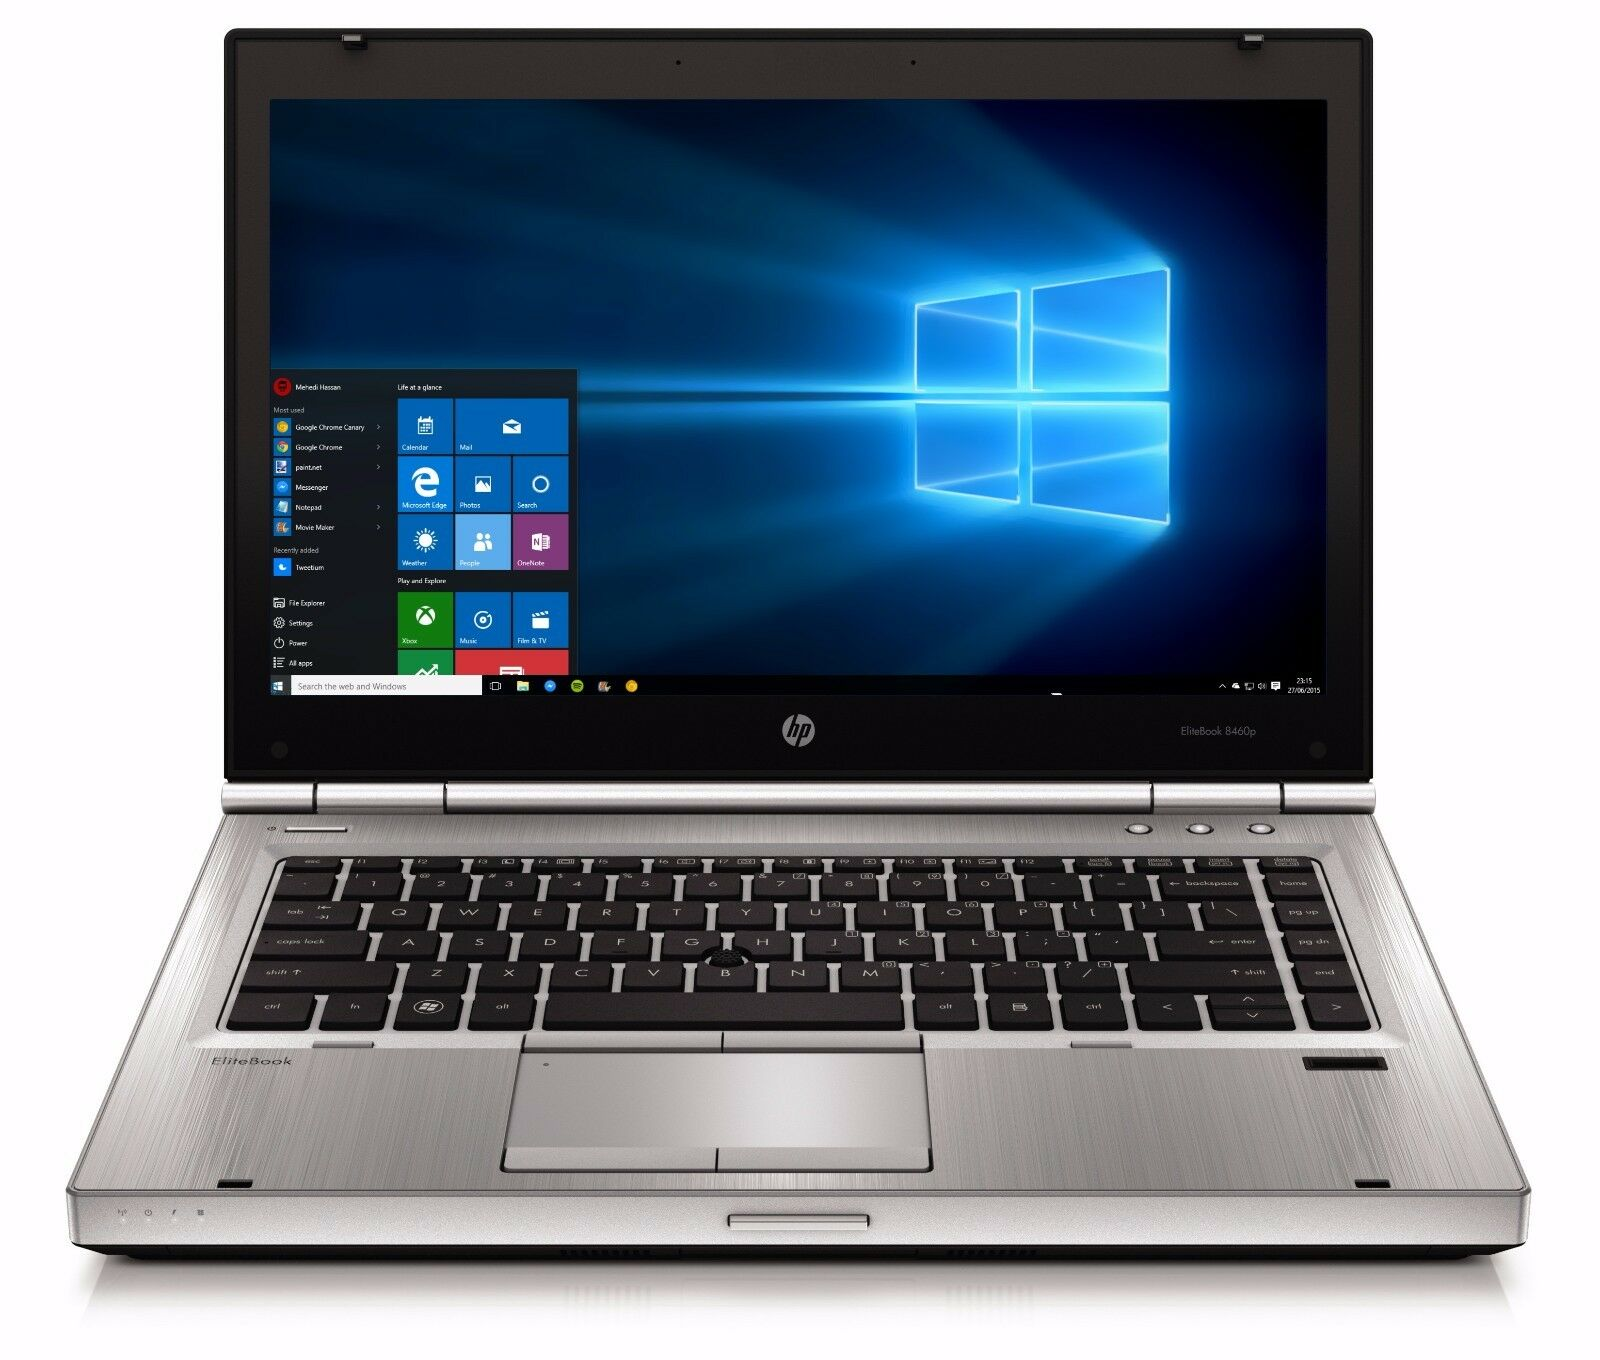 Laptop - High End HP Elitebook Laptop Intel Core i5 8GB 1TB Windows 10 Wifi